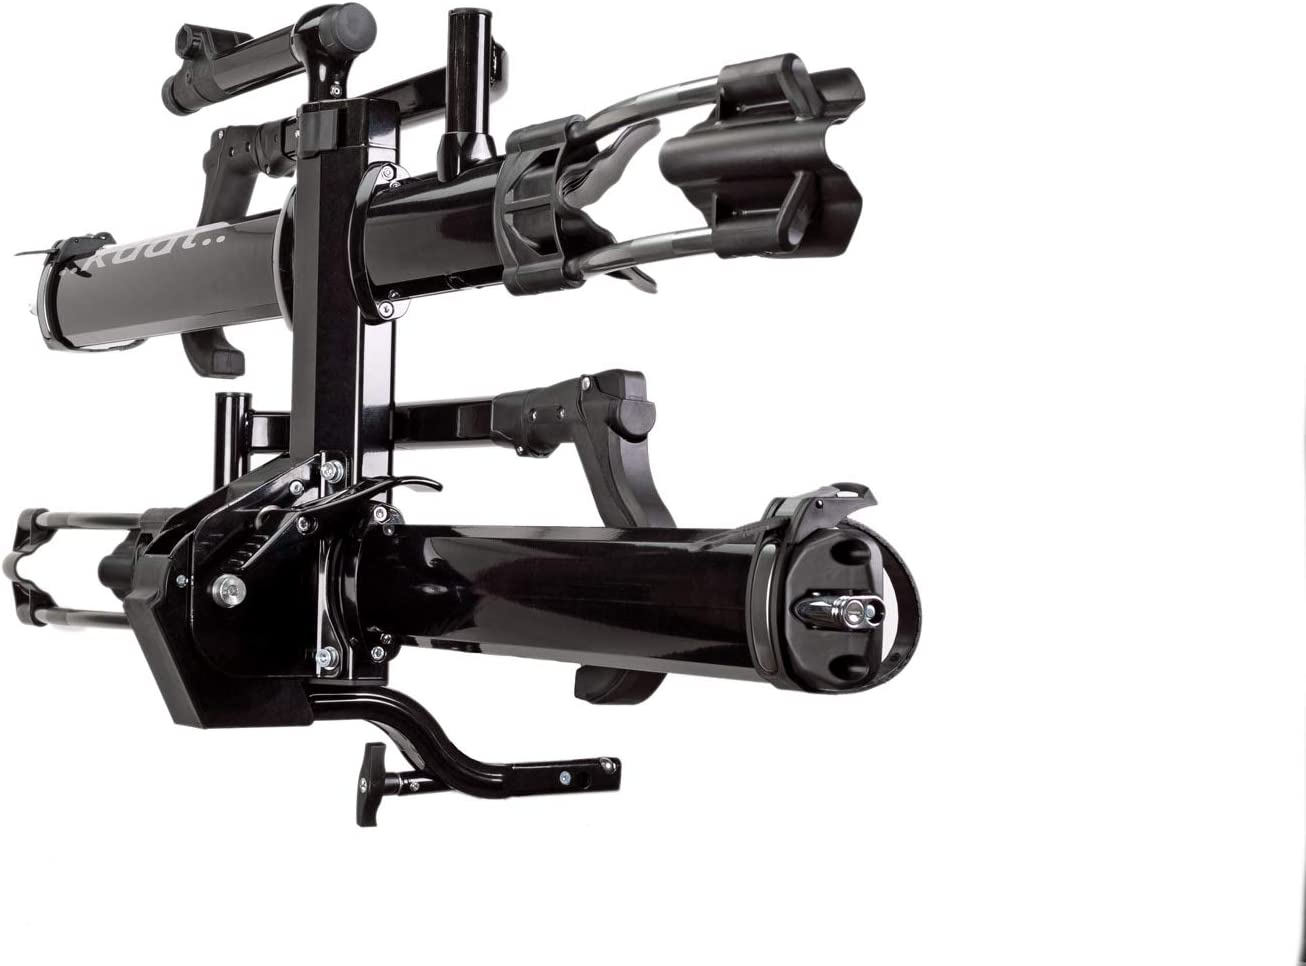 NA22B +2-Bike Rack Kuat Hitch Mounted NV Add-On 2.0-2 Black Metallic